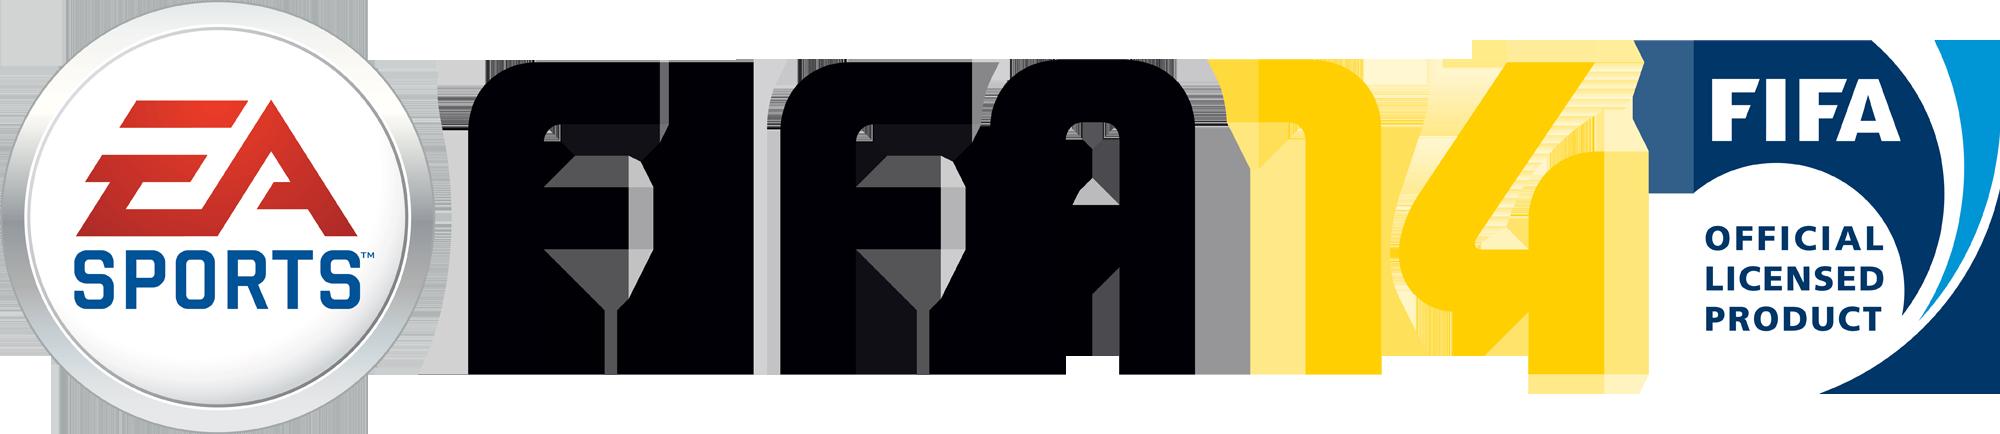 http://logos.wikia.com/wiki/FIFA_(video_game_series)?oldid=328981